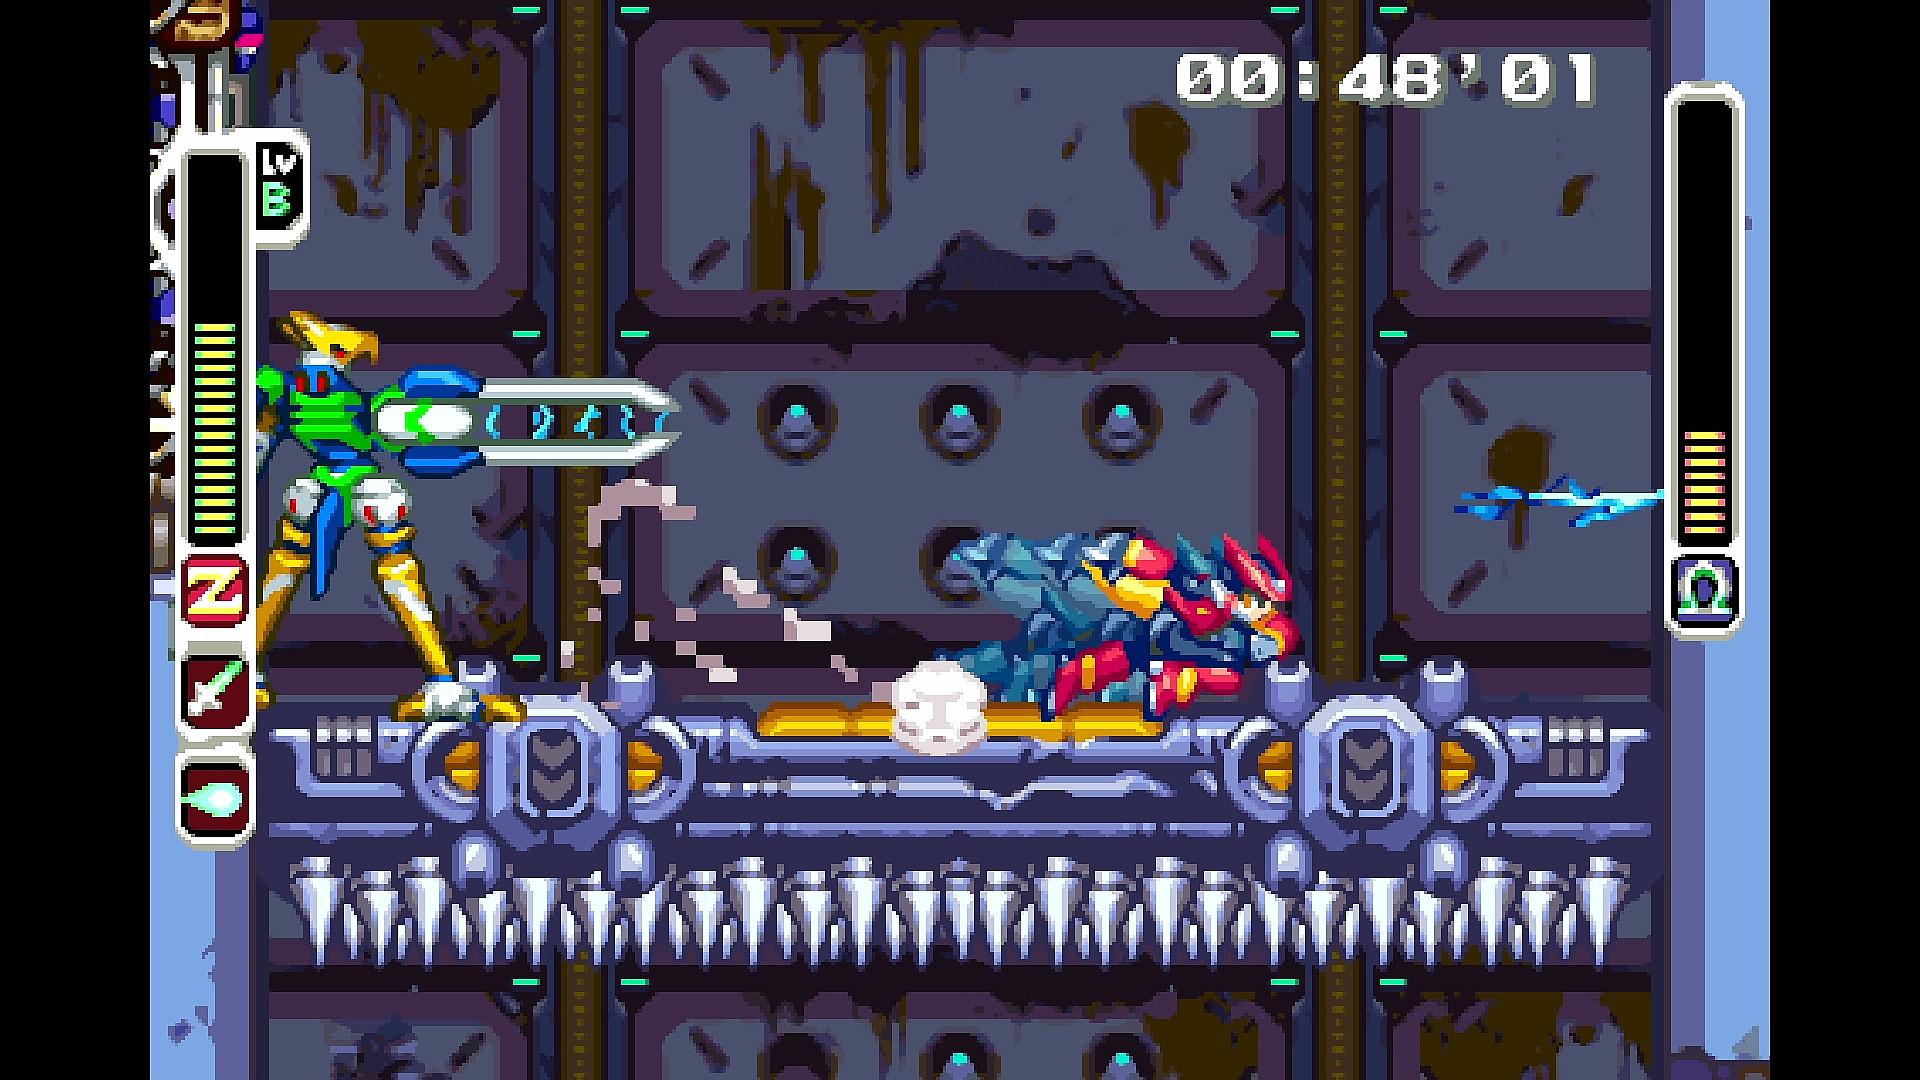 洛克人Zero/ZX遗产合集/Mega Man Zero/ZX Legacy Collection插图7